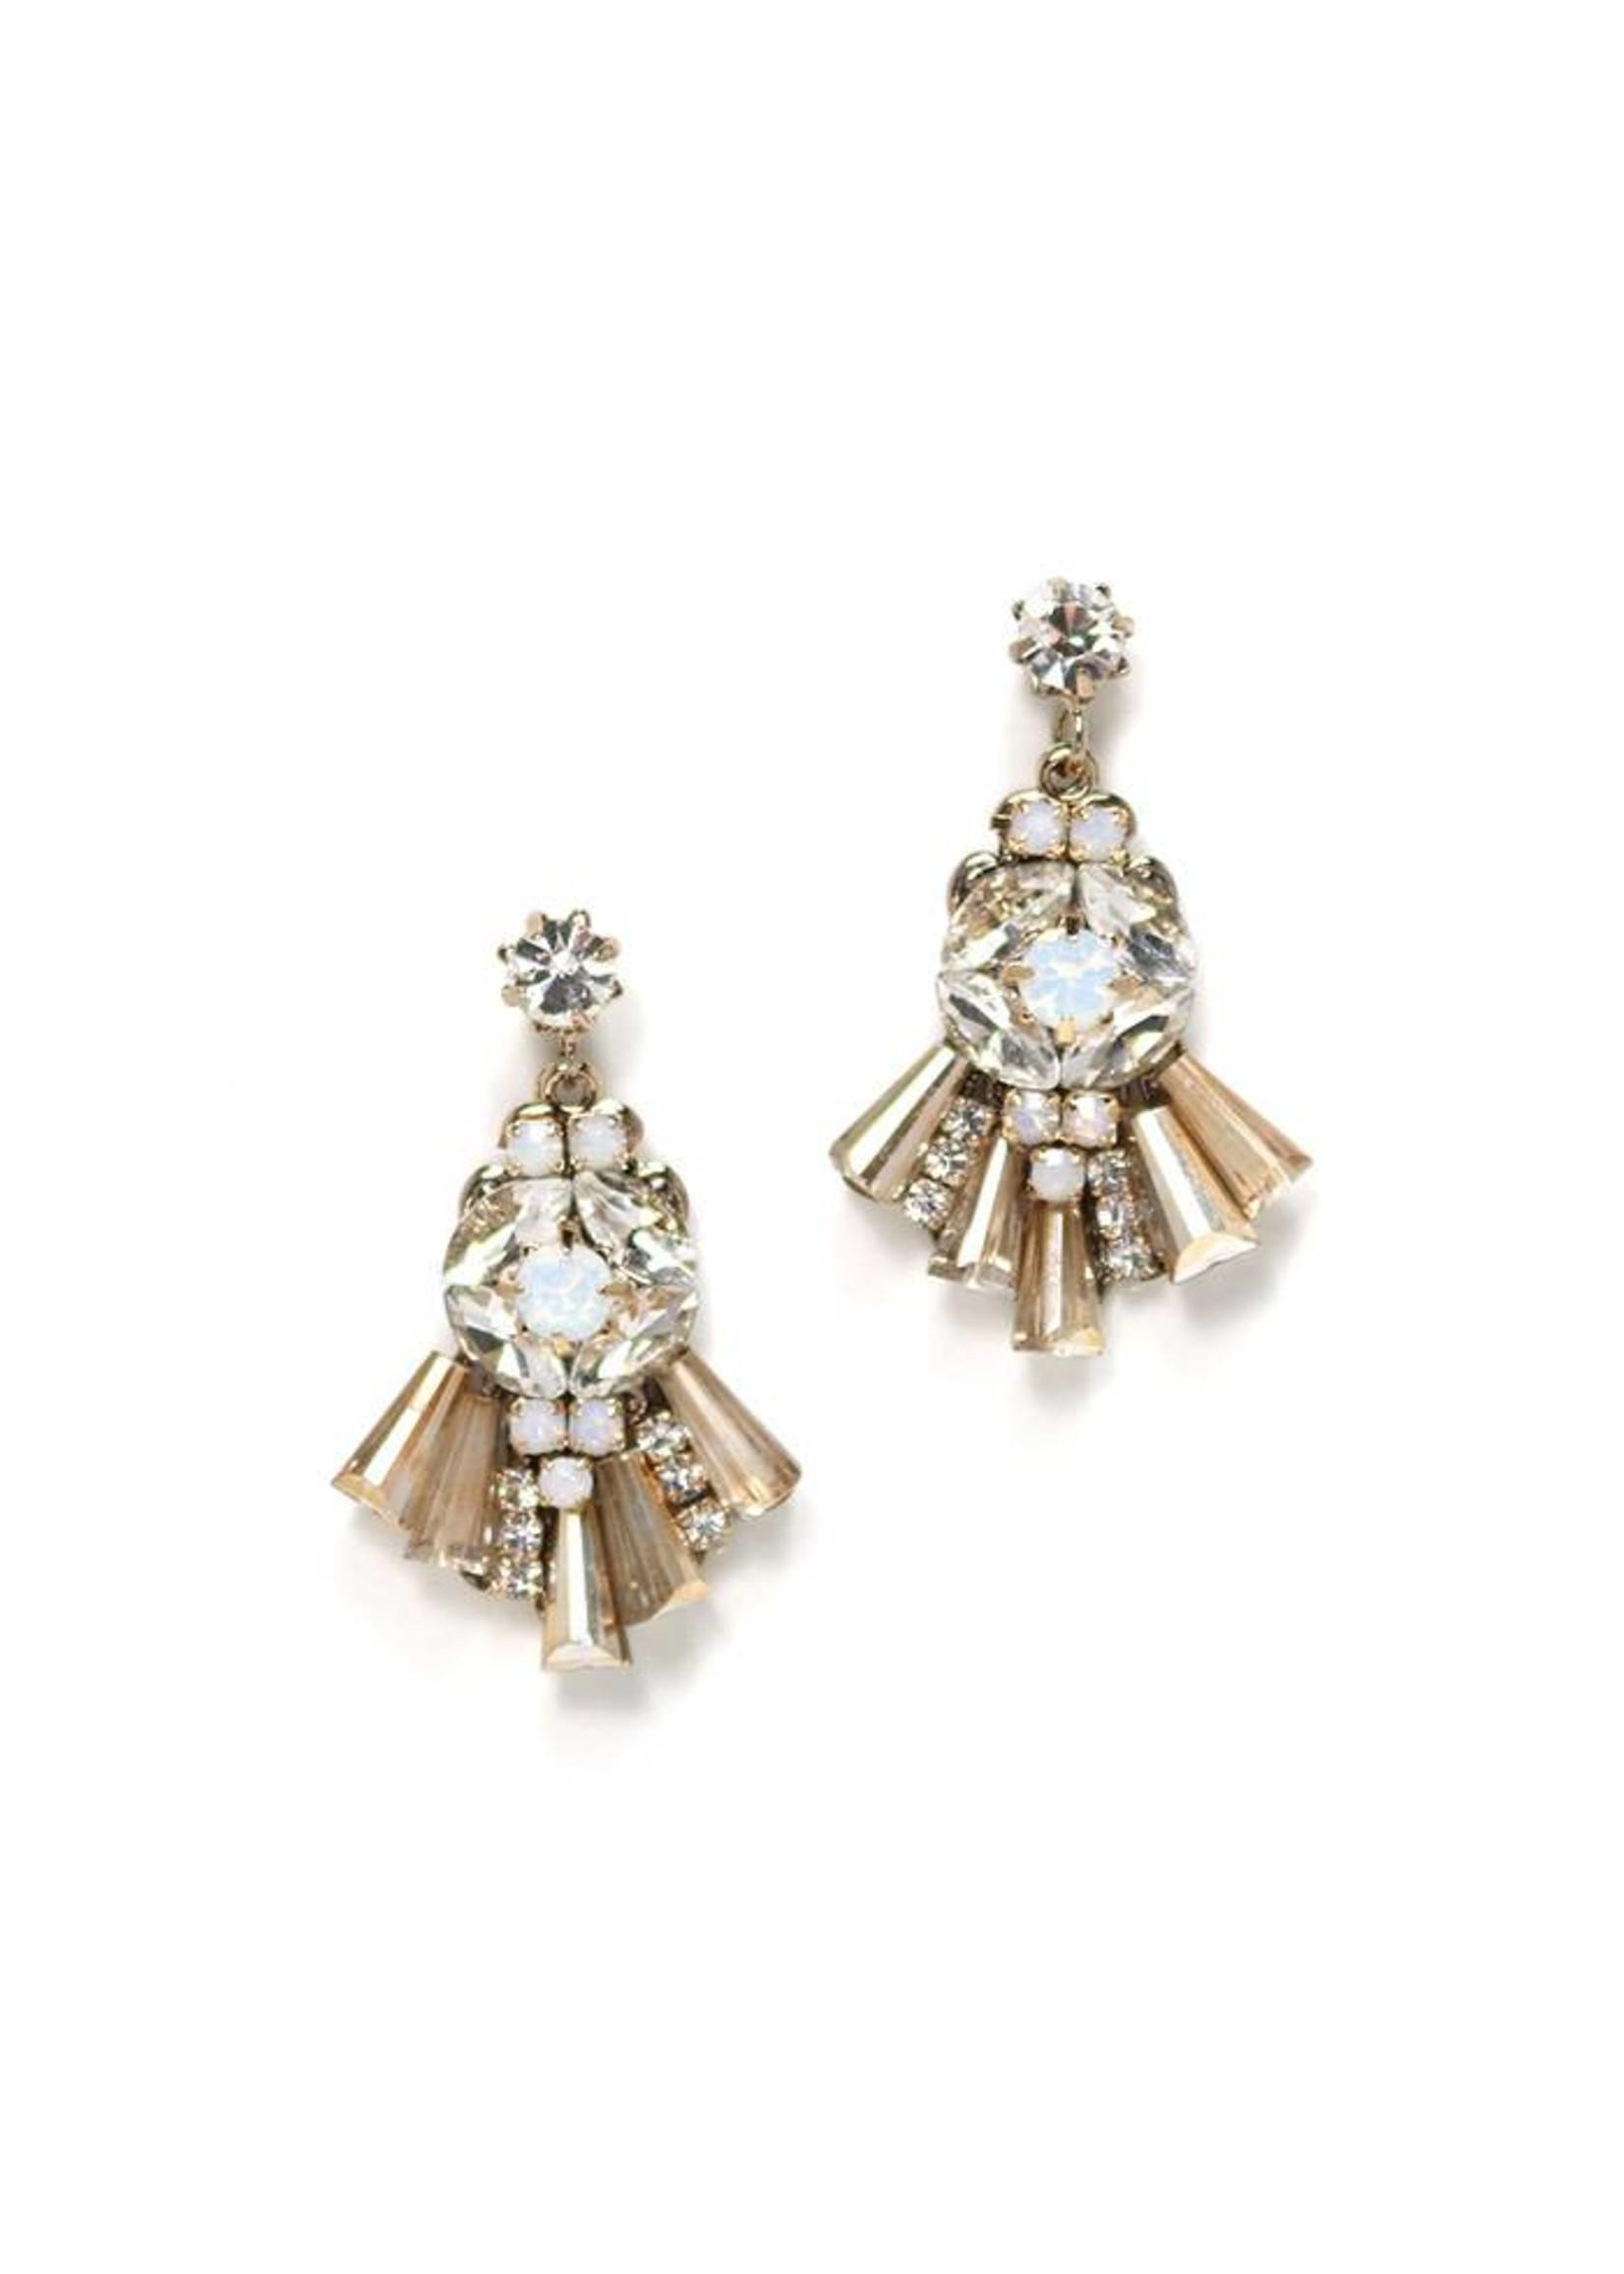 Rococo Drop Earrings- Champagne